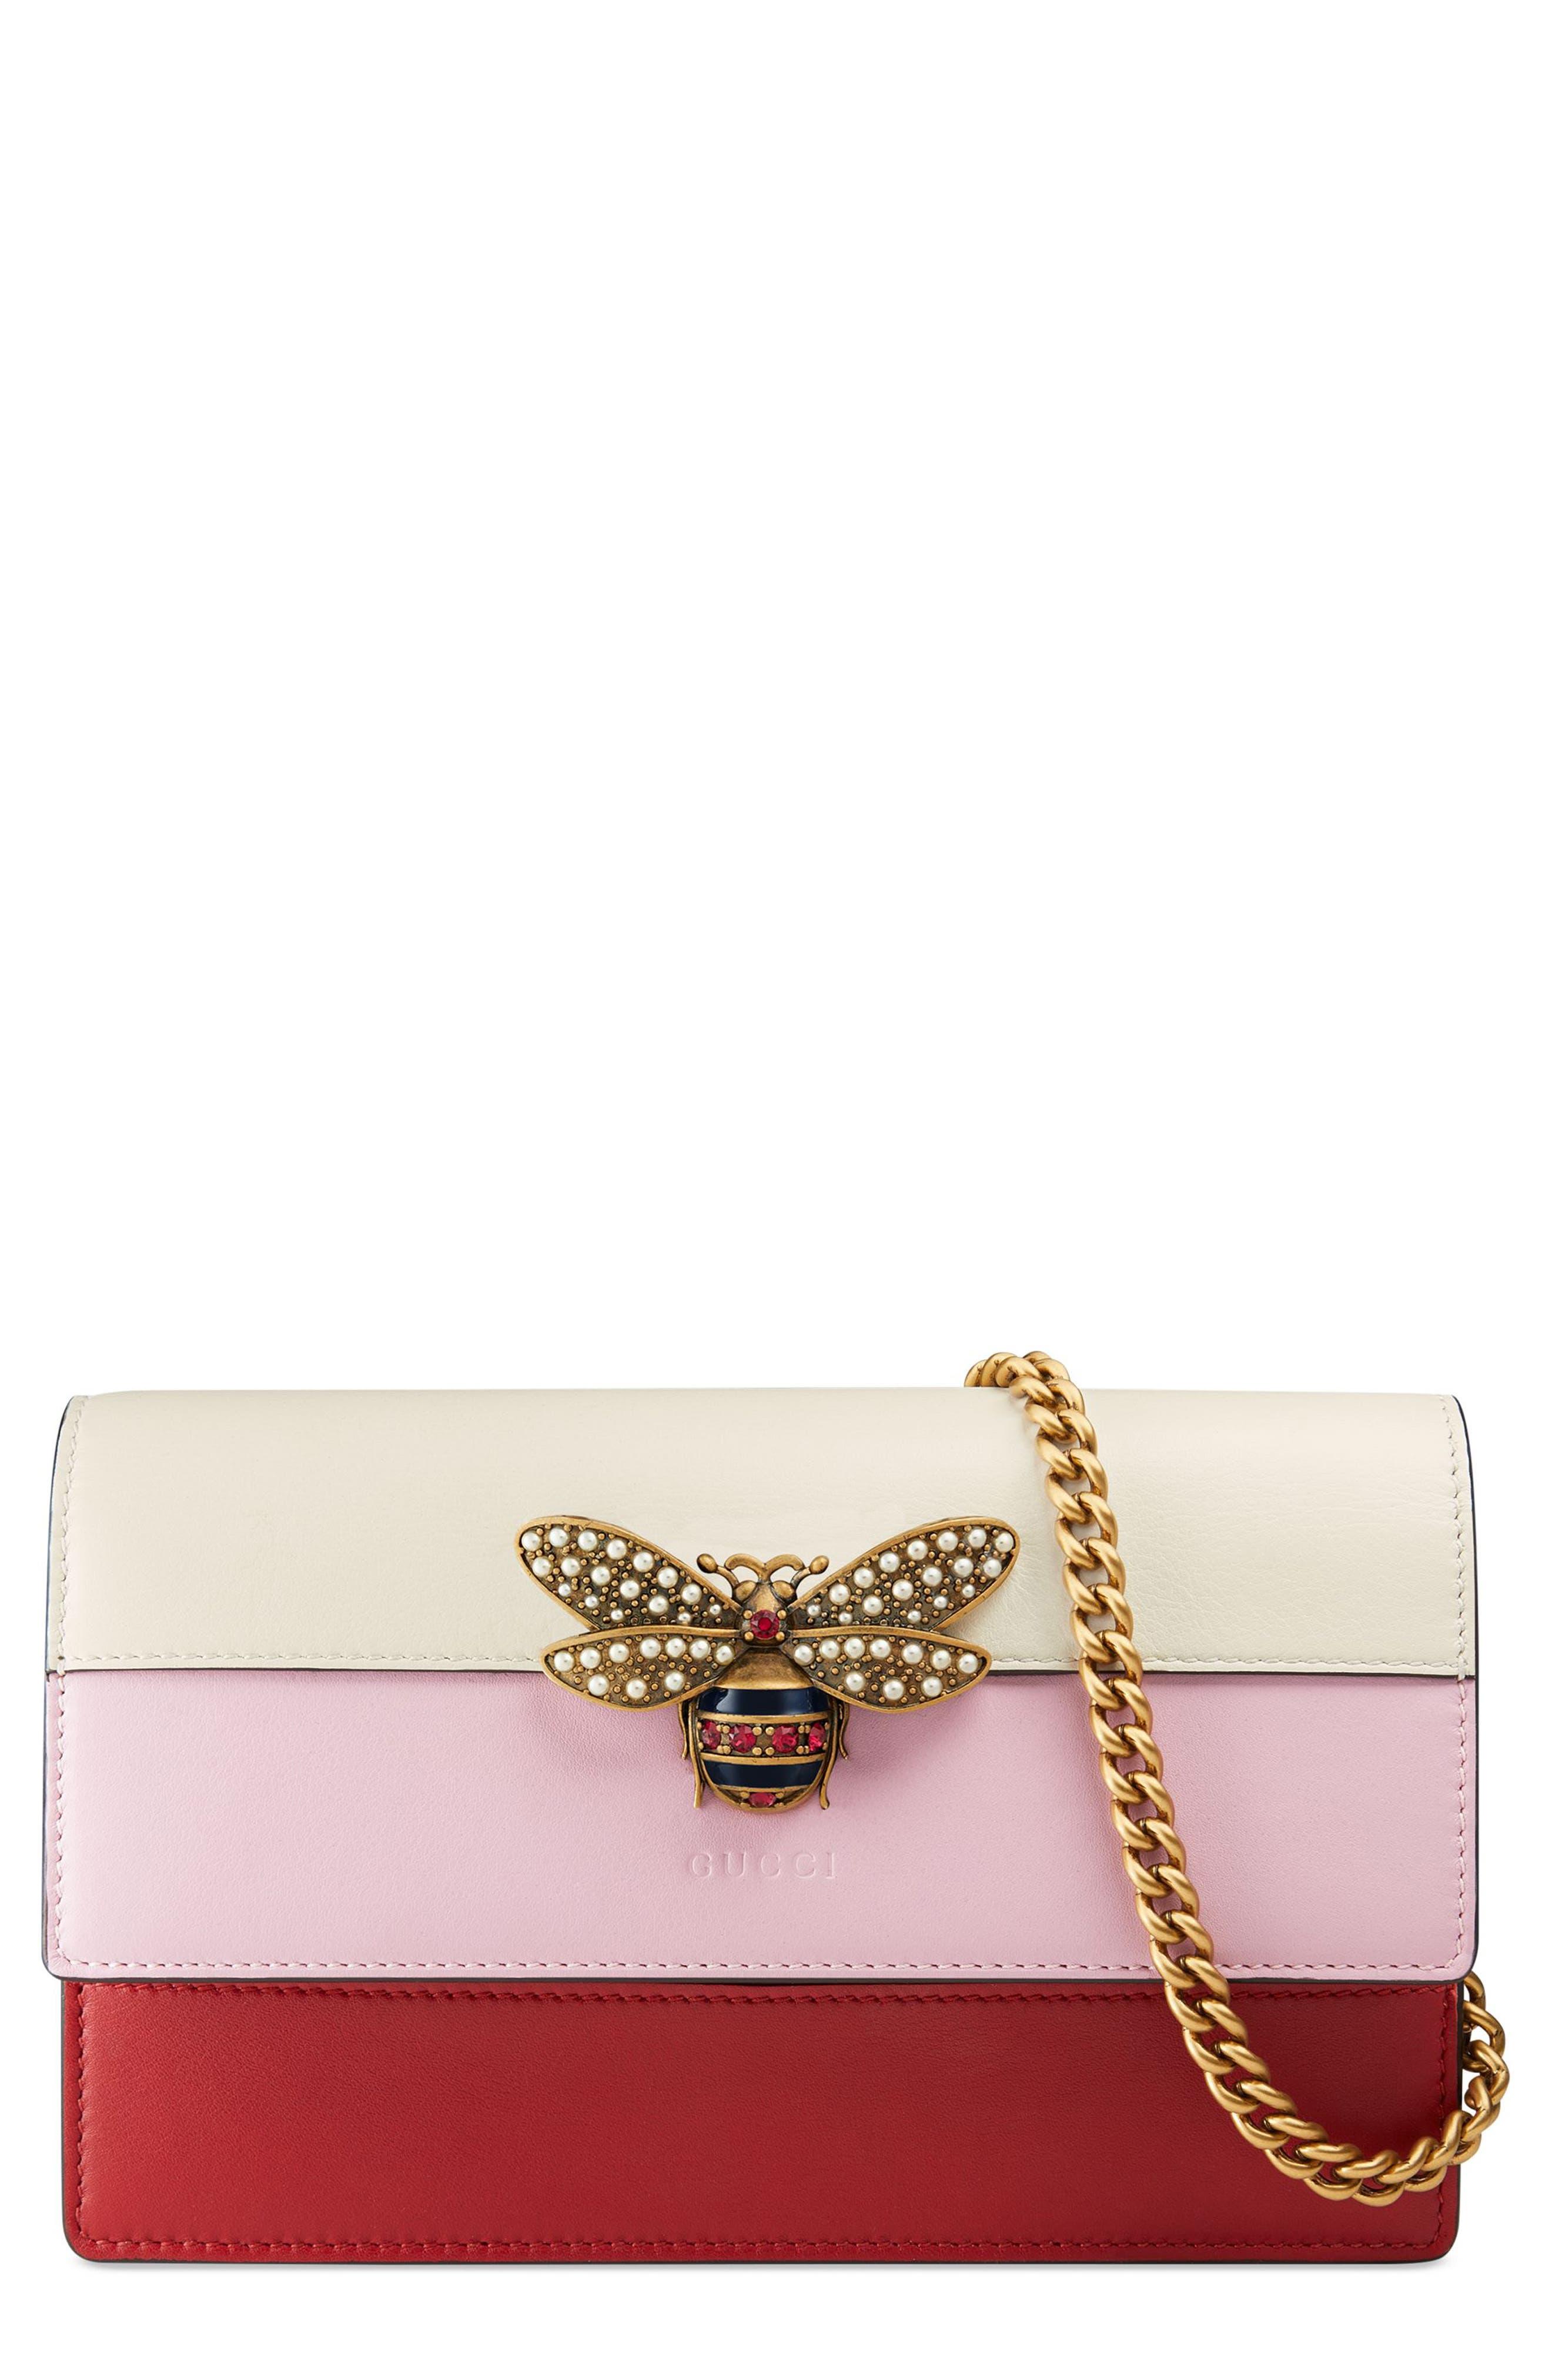 Mini Bee Multistripe Leather Shoulder Bag,                             Main thumbnail 1, color,                             650